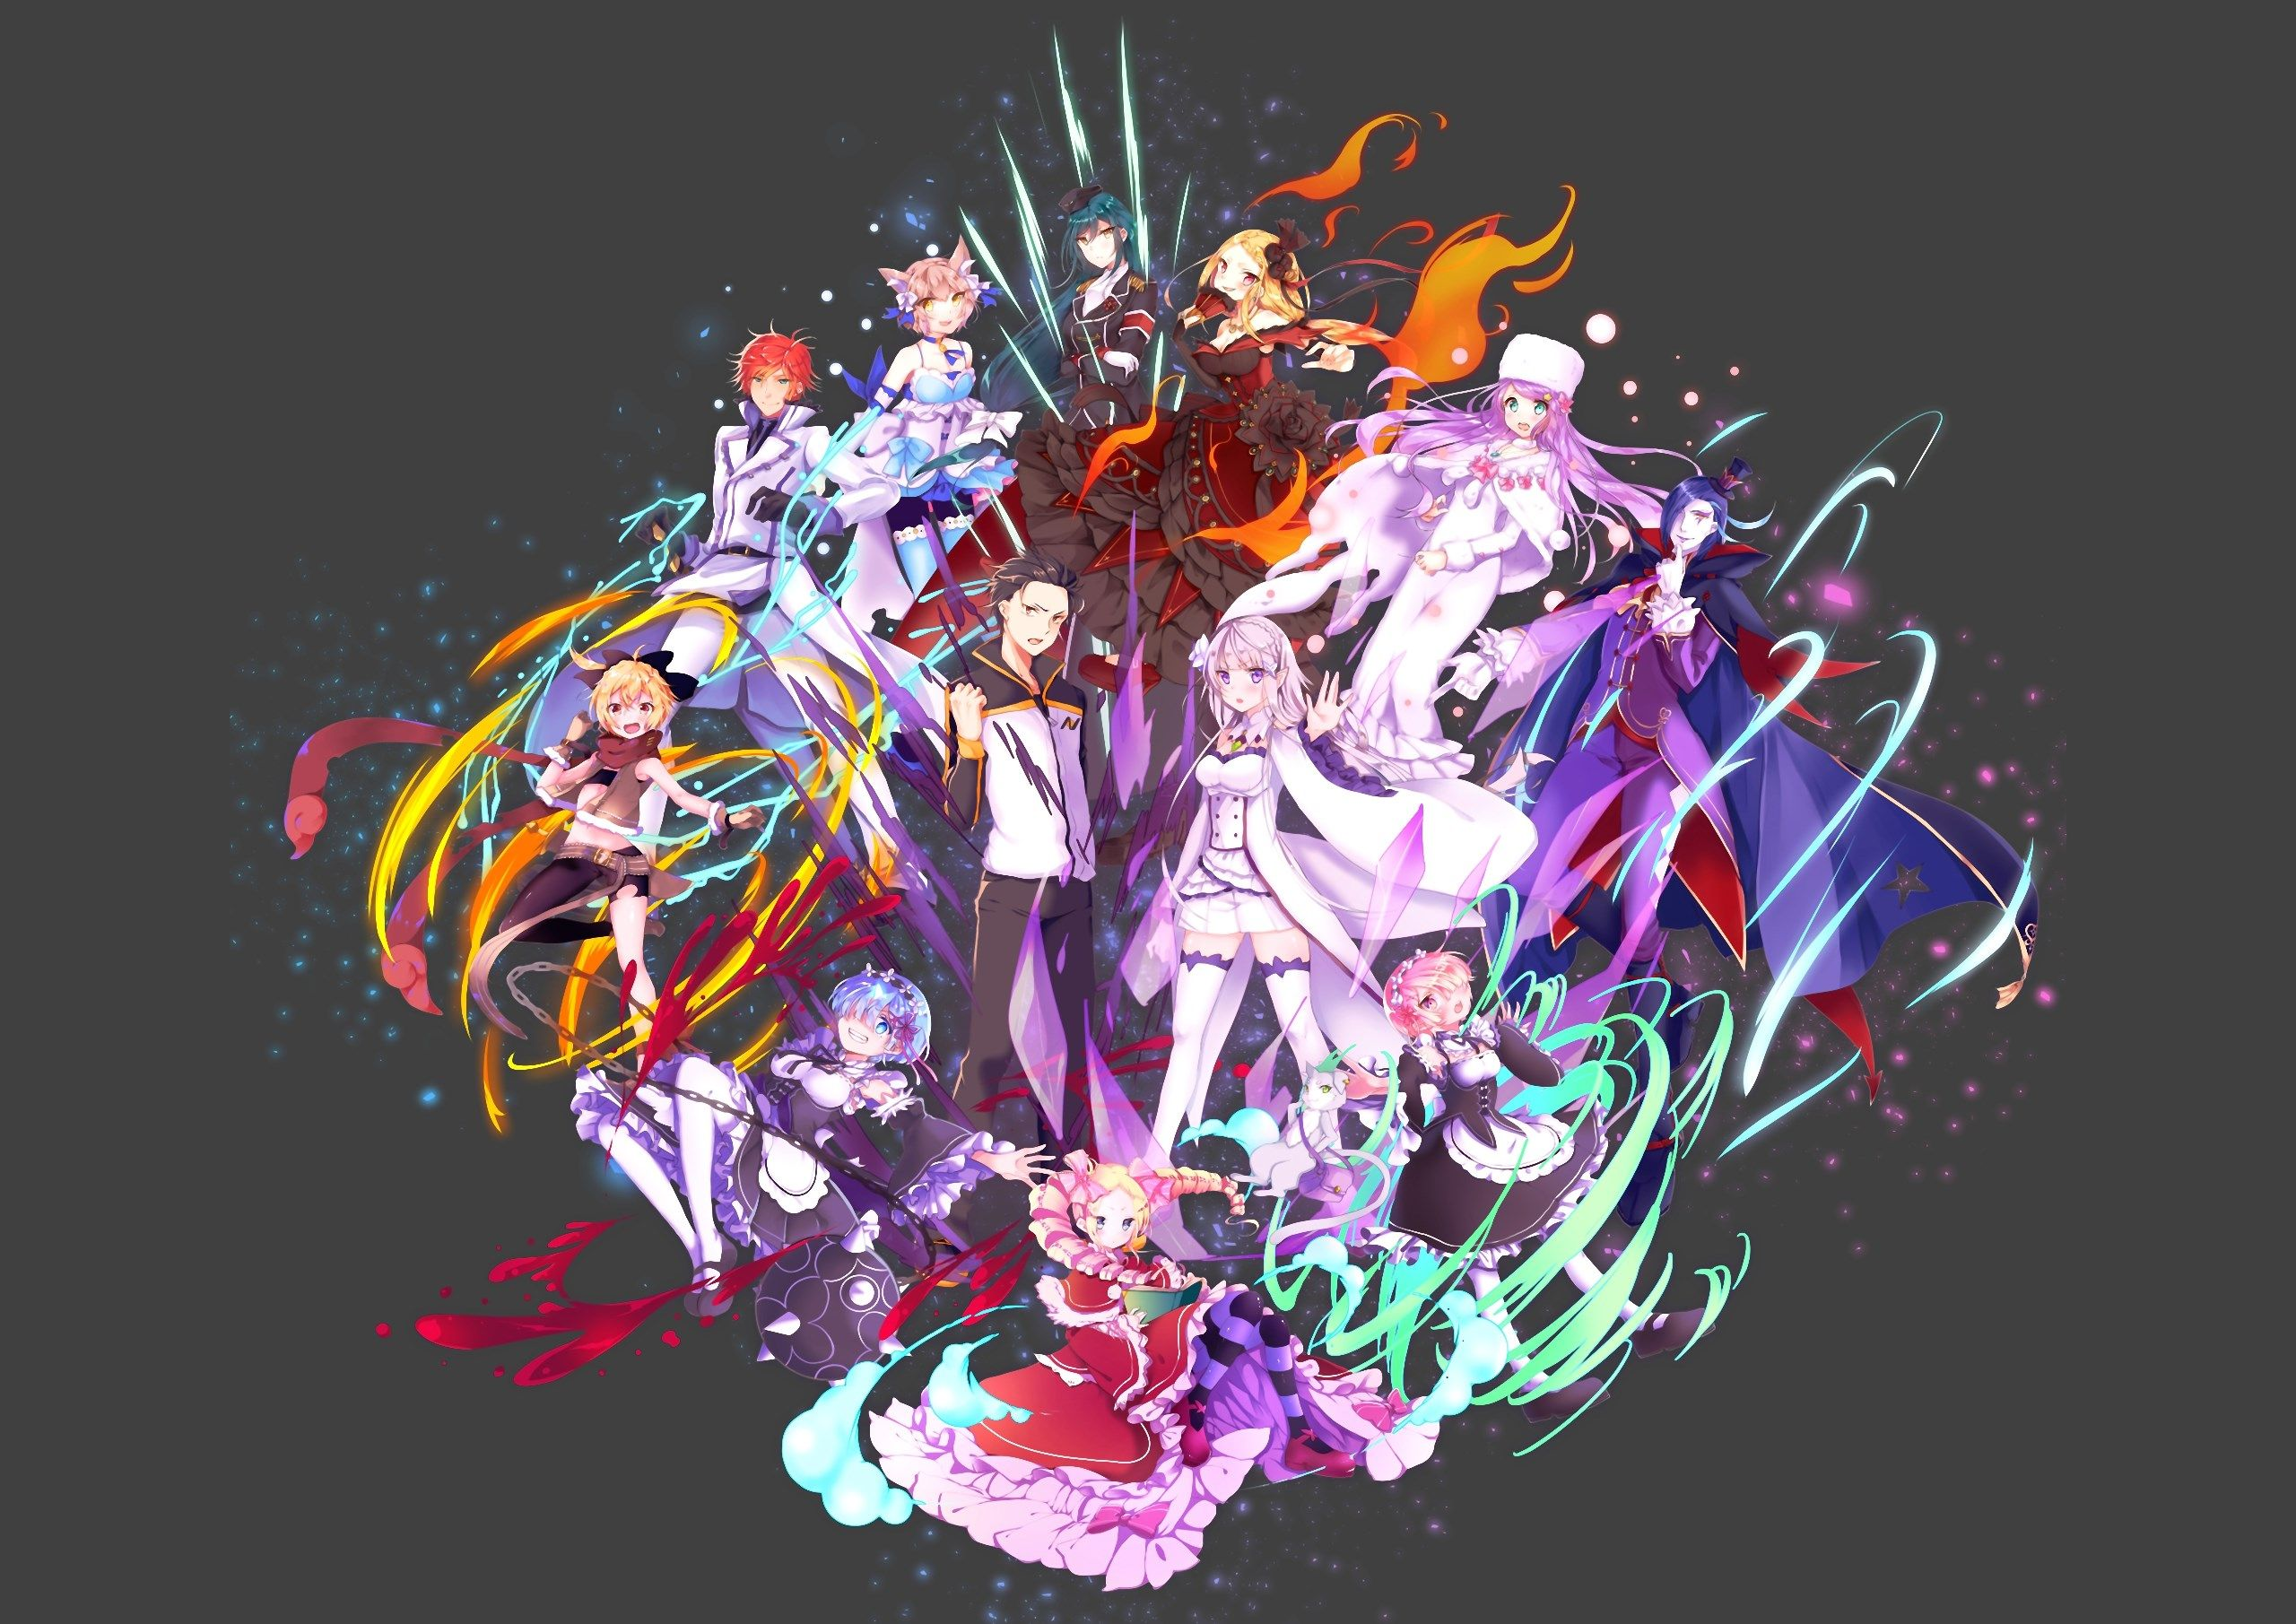 2560x1811 High Resolution Wallpaper rezero starting life